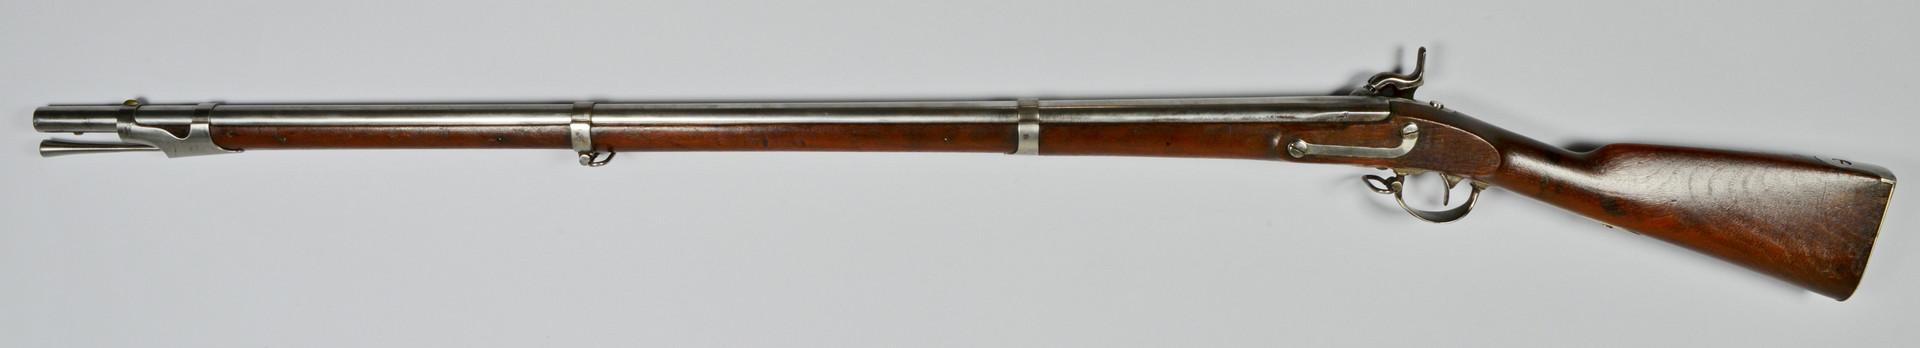 Lot 416: U. S. Model 1842 Percussion Musket